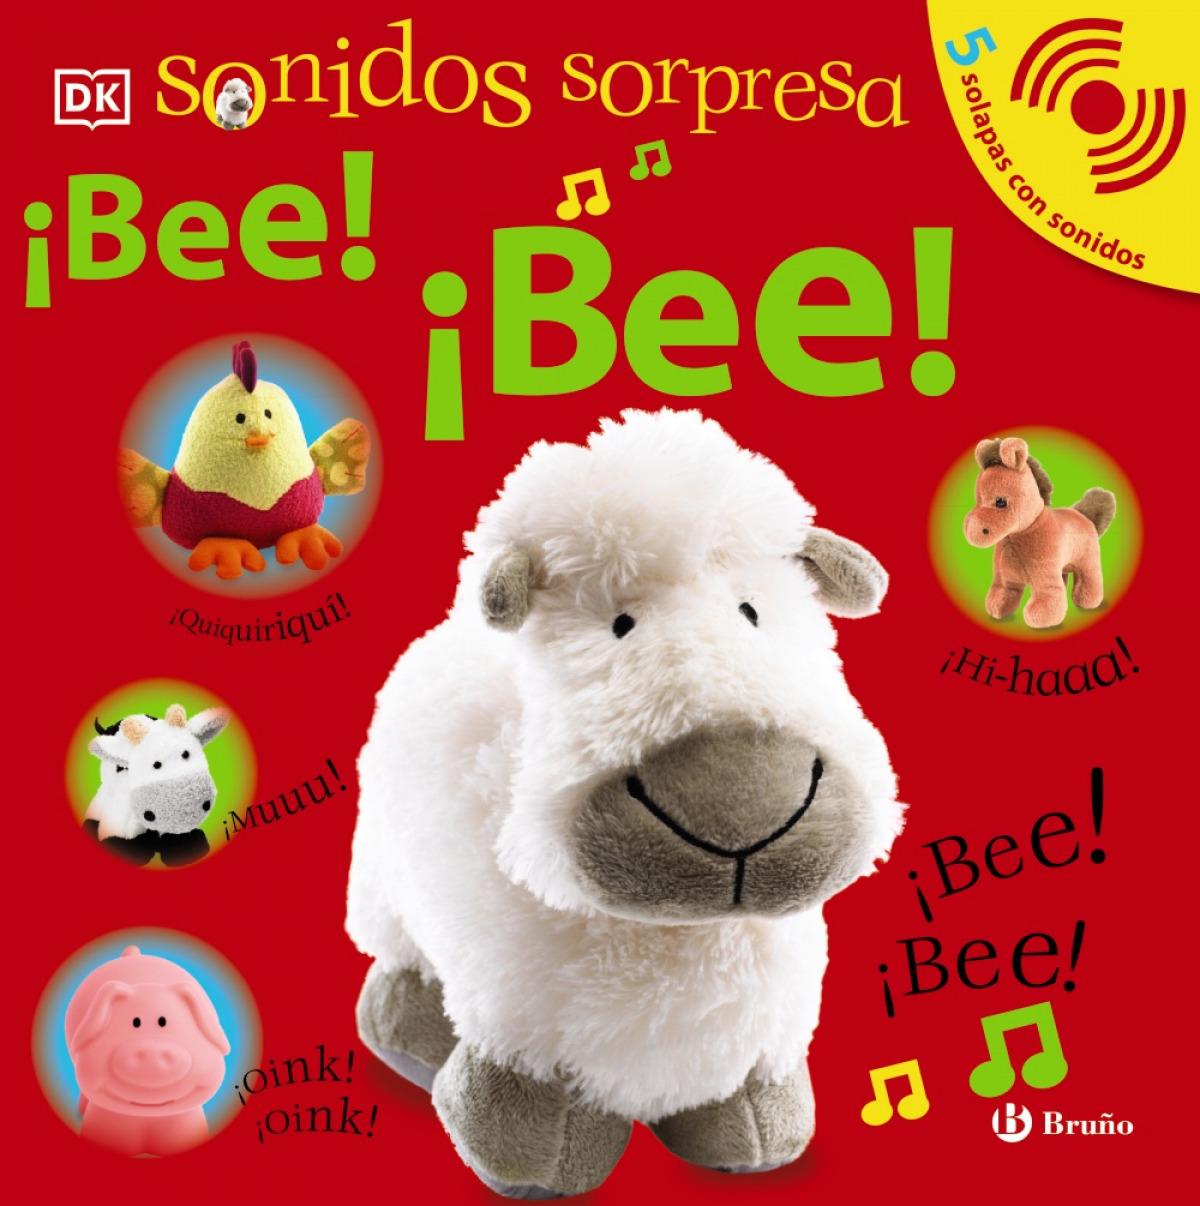 Sonidos sorpresa - ¡Bee! ¡Bee!